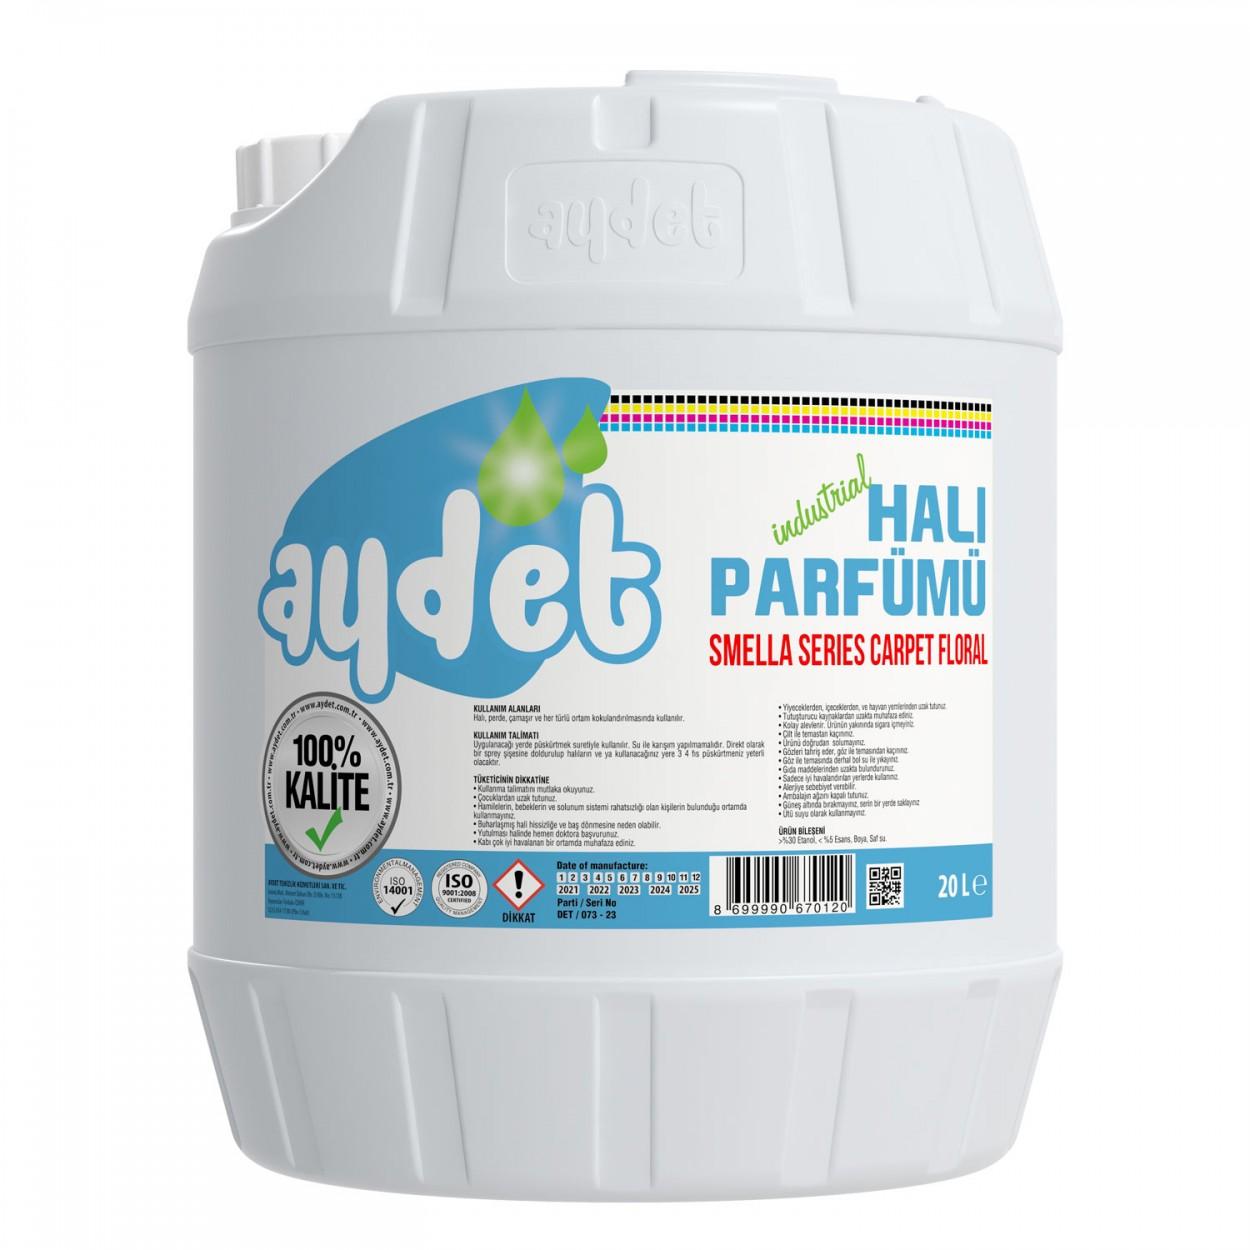 Carpetfloral Halı Parfümü 20 Kg